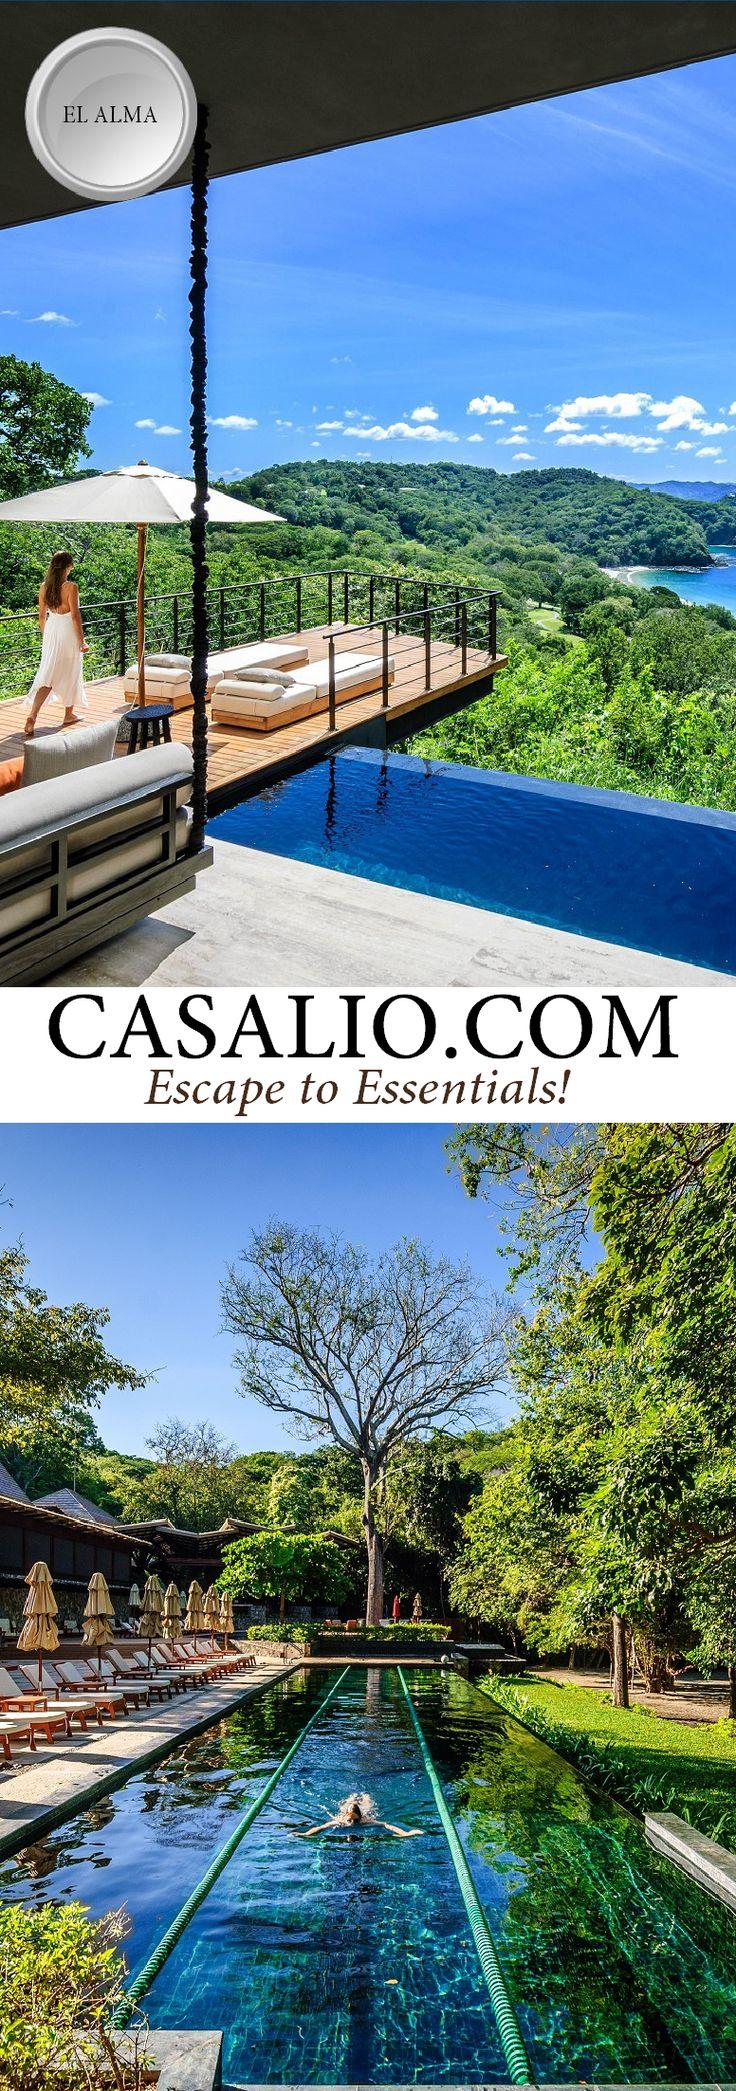 Ferienvilla   Villa Rental Ferienhaus   El Alma is a 3 bedroom designer luxury villa in the lush hills of the Papagayo Peninsula #costarica #papagayo #villarental #luxury #luxurytravel #casalio #travel #reisen #urlaub #ferienvilla #luxusvillen #luxusvilla #ferienhaus